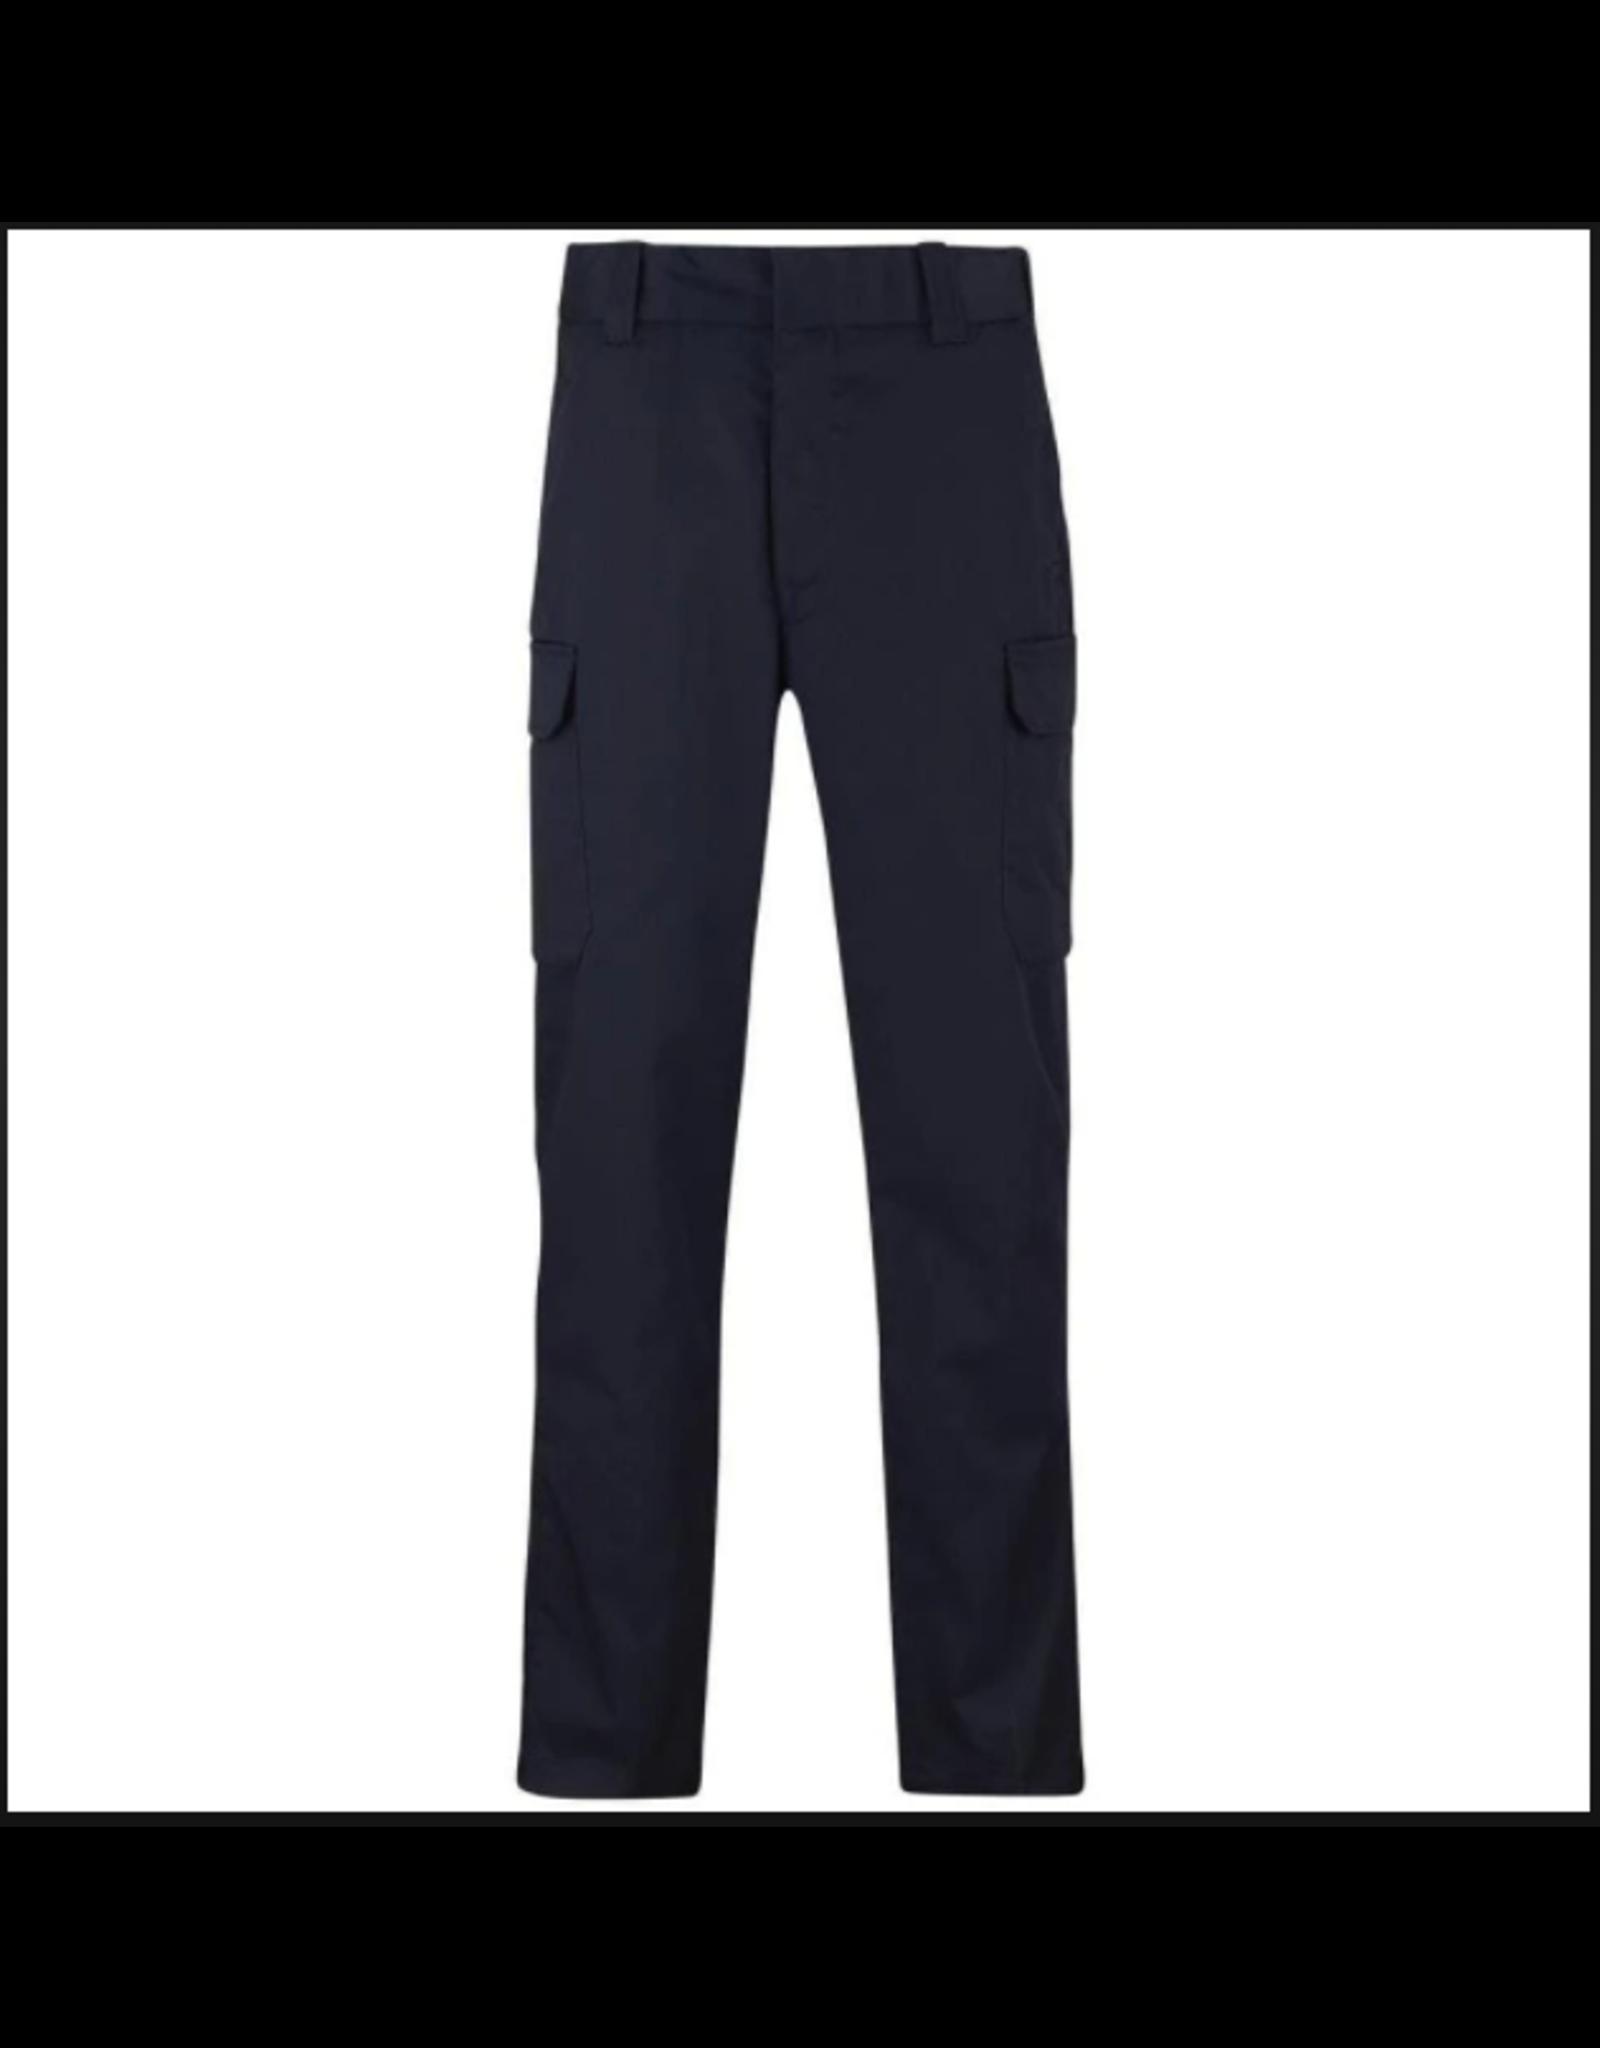 Propper Men's Class B Cargo Pants 36/32